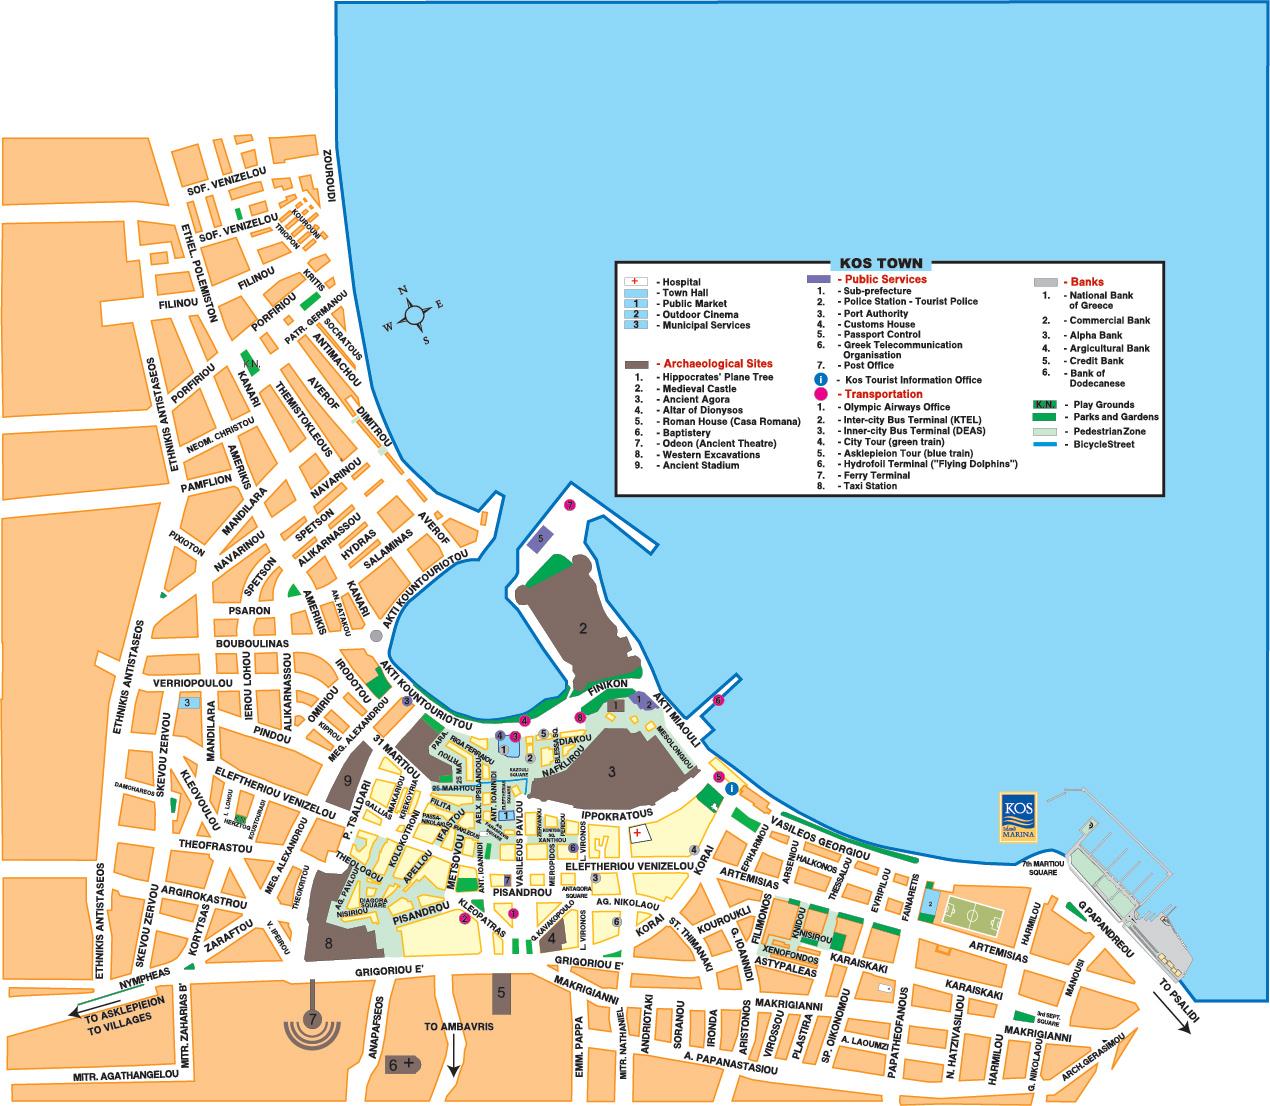 Kos Town Kos Island Interactive map